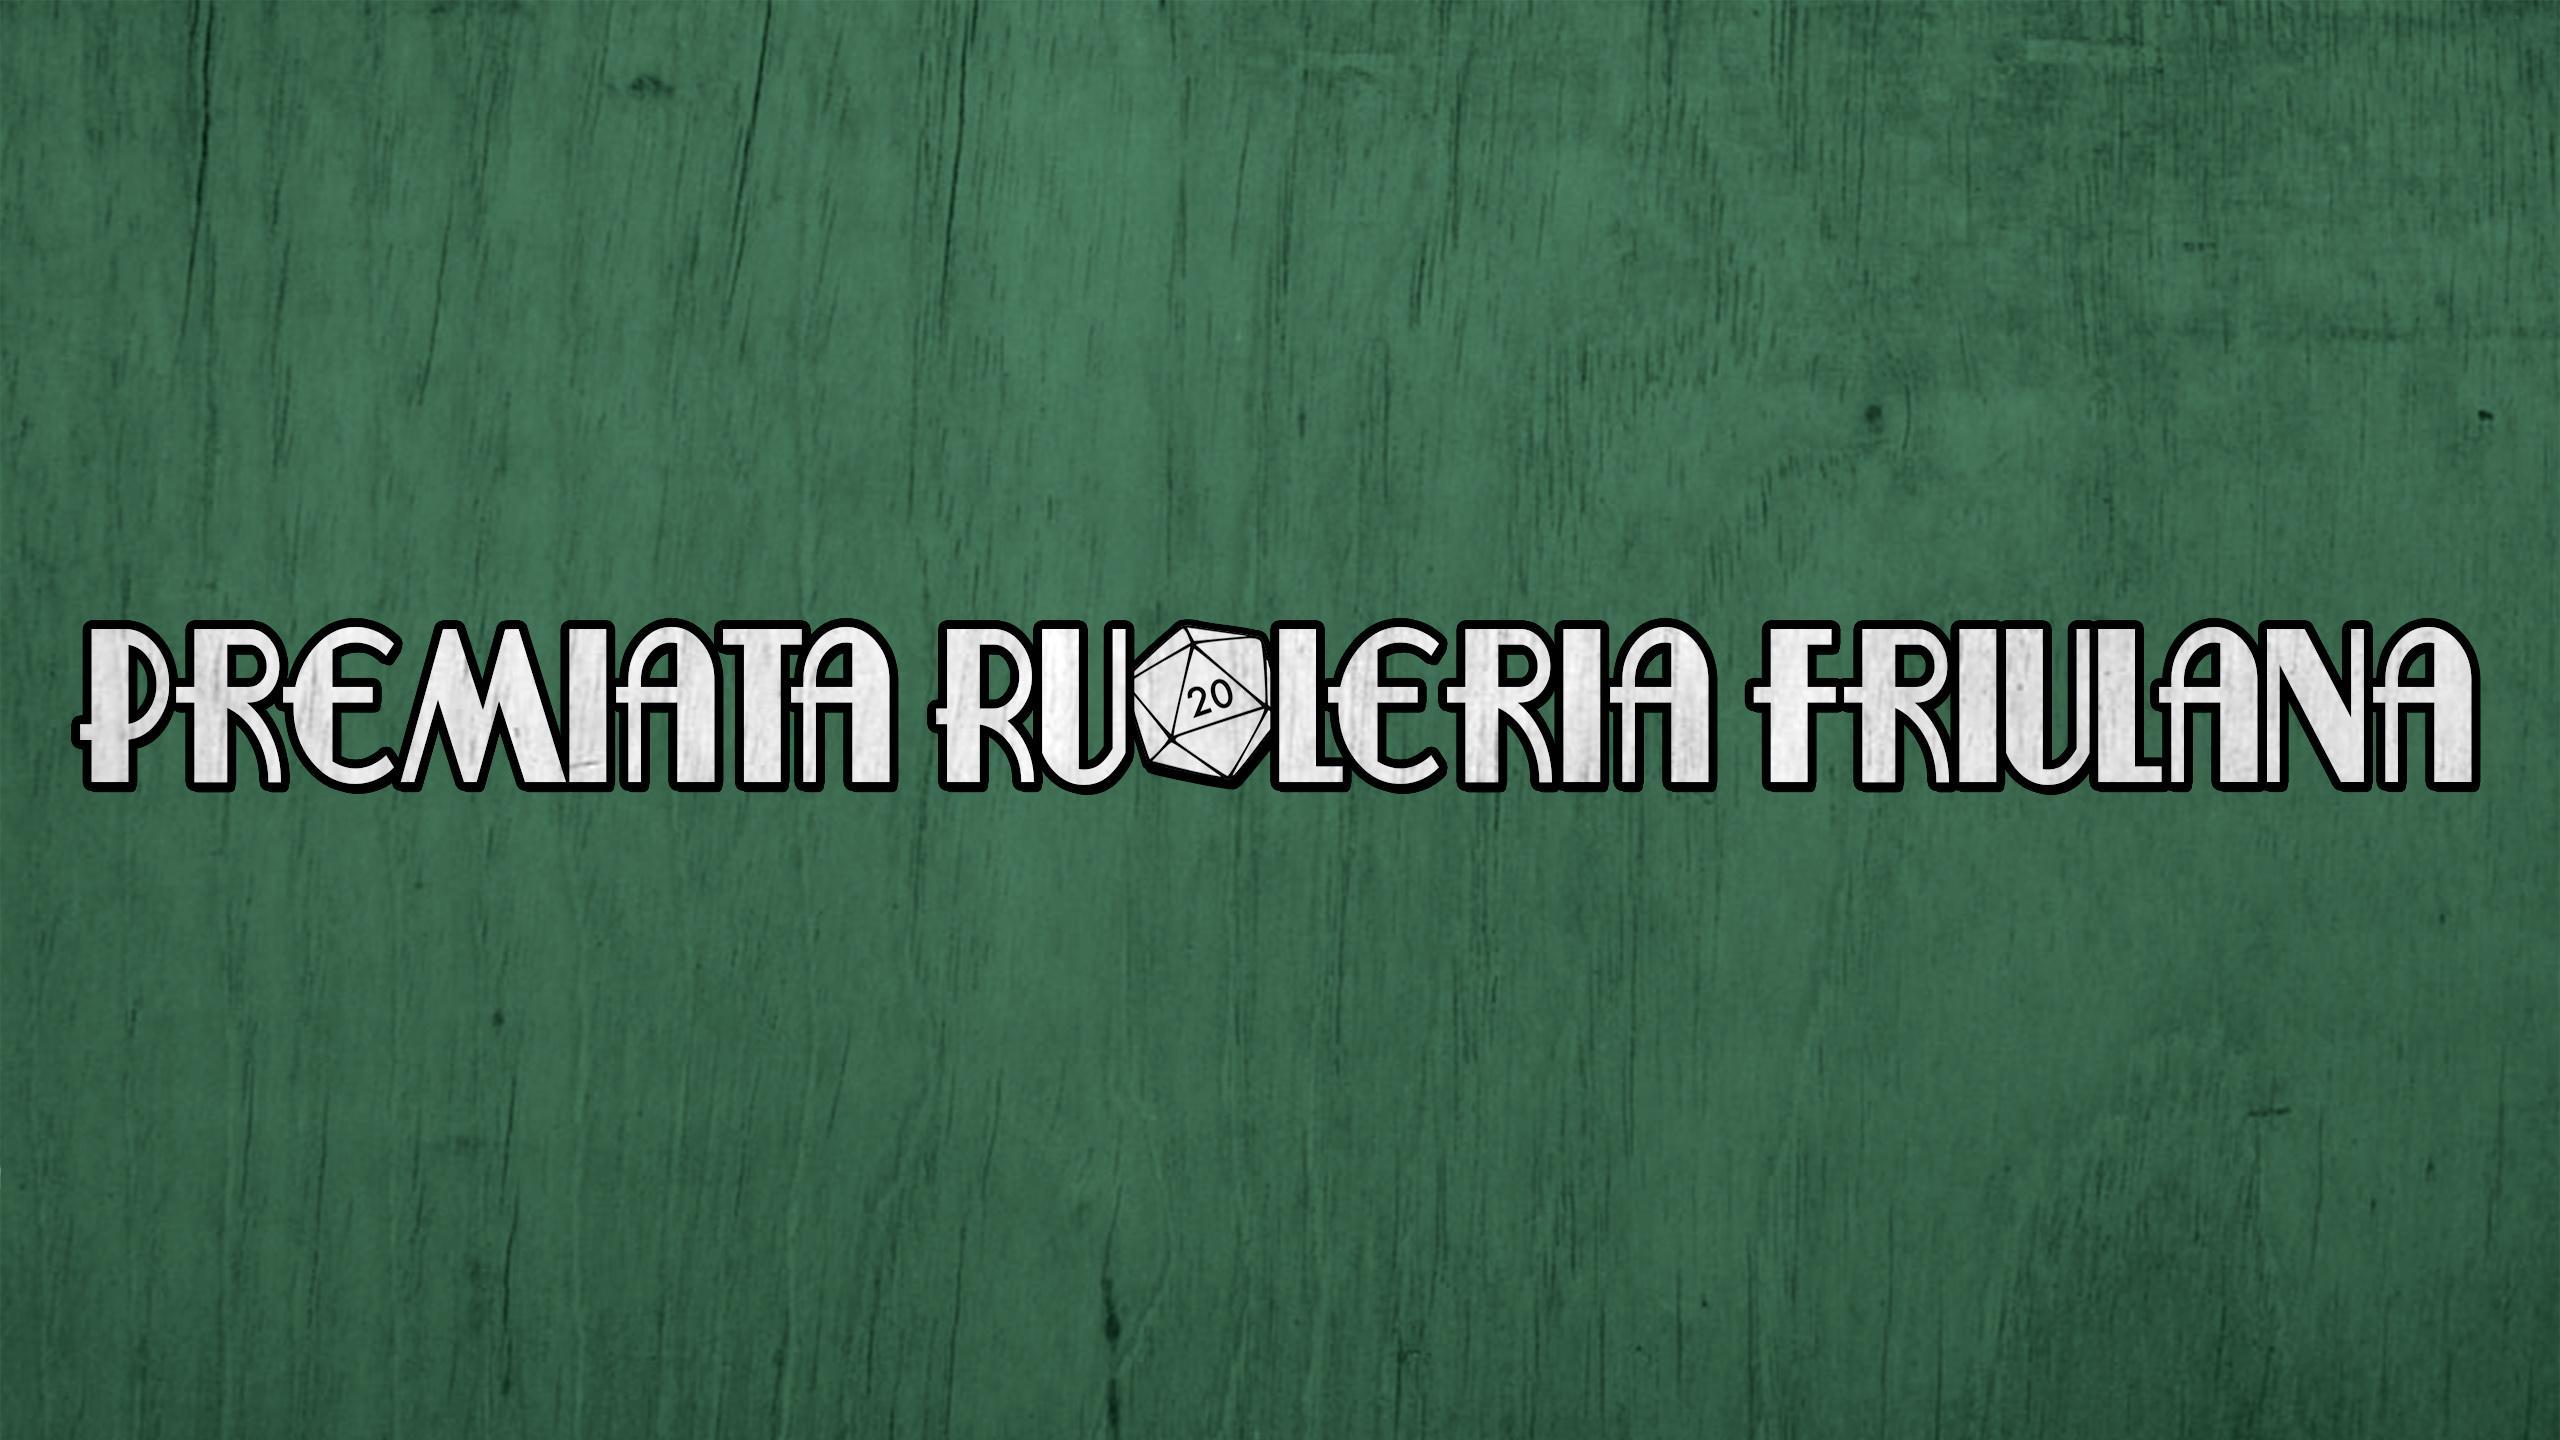 Premiata Ruoleria Friulana